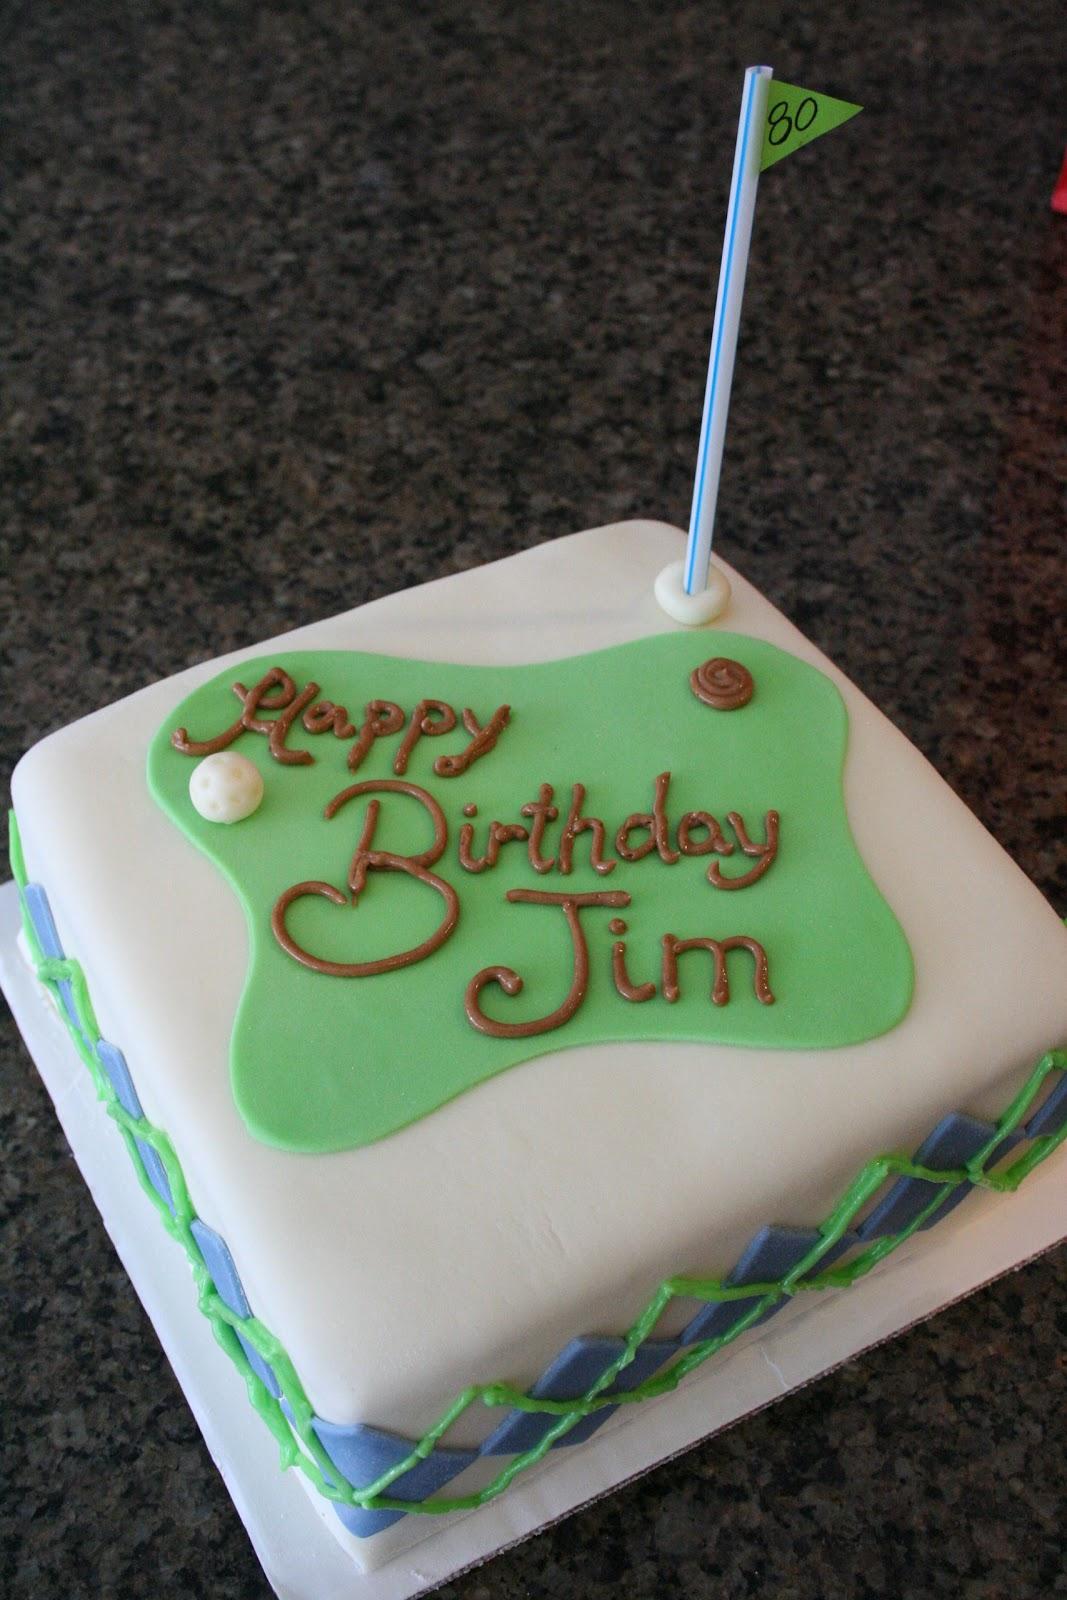 Happy Birthday Jimmy Cake Images